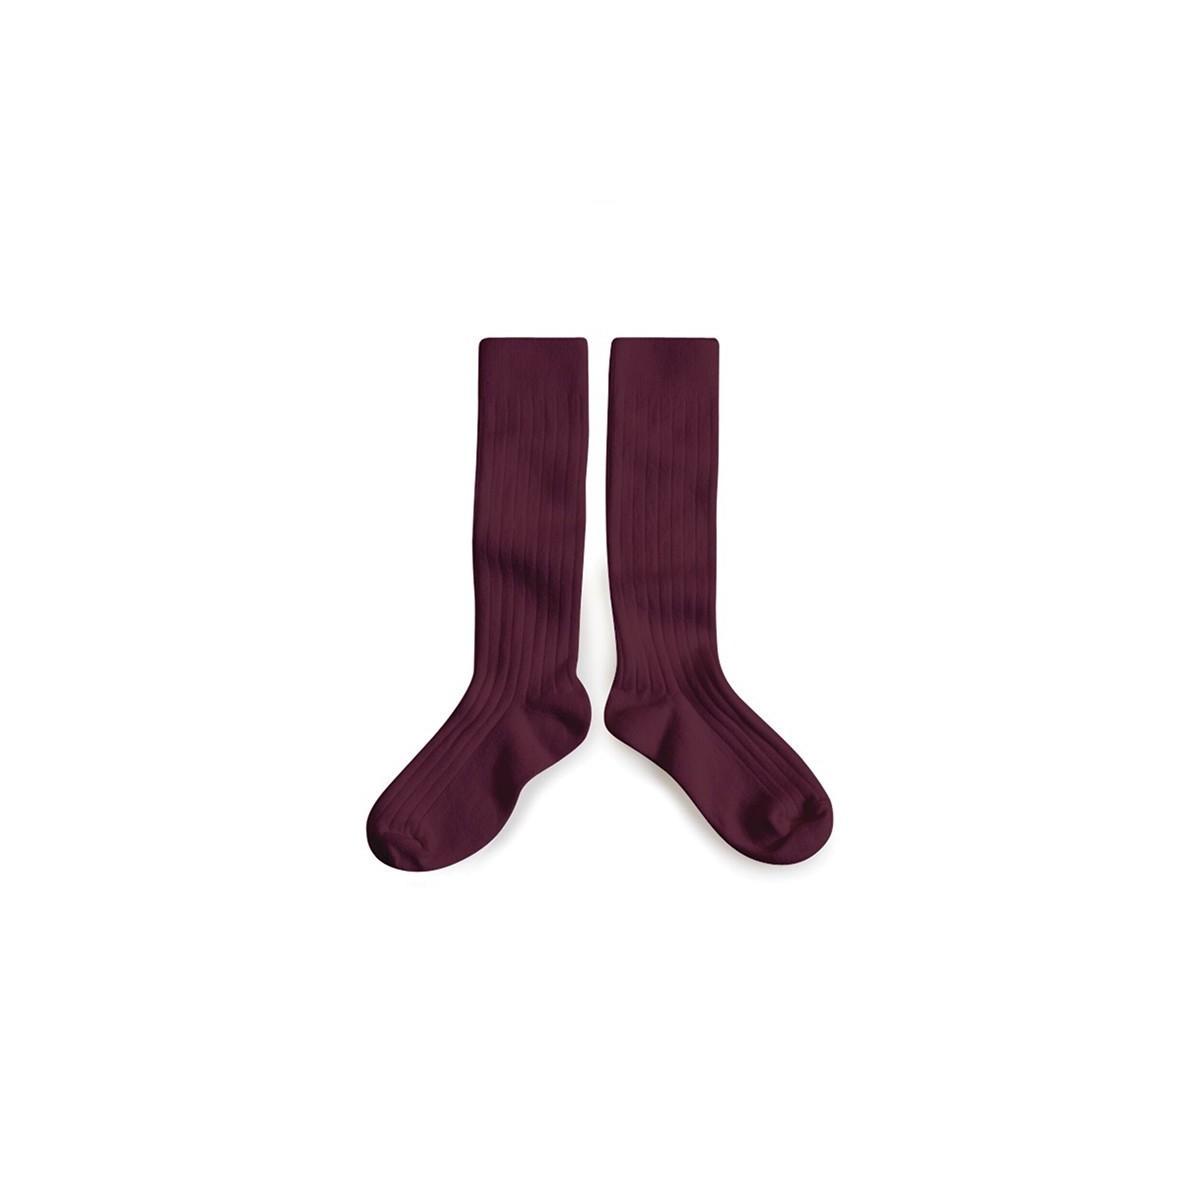 Chaussettes hautes Aubergine